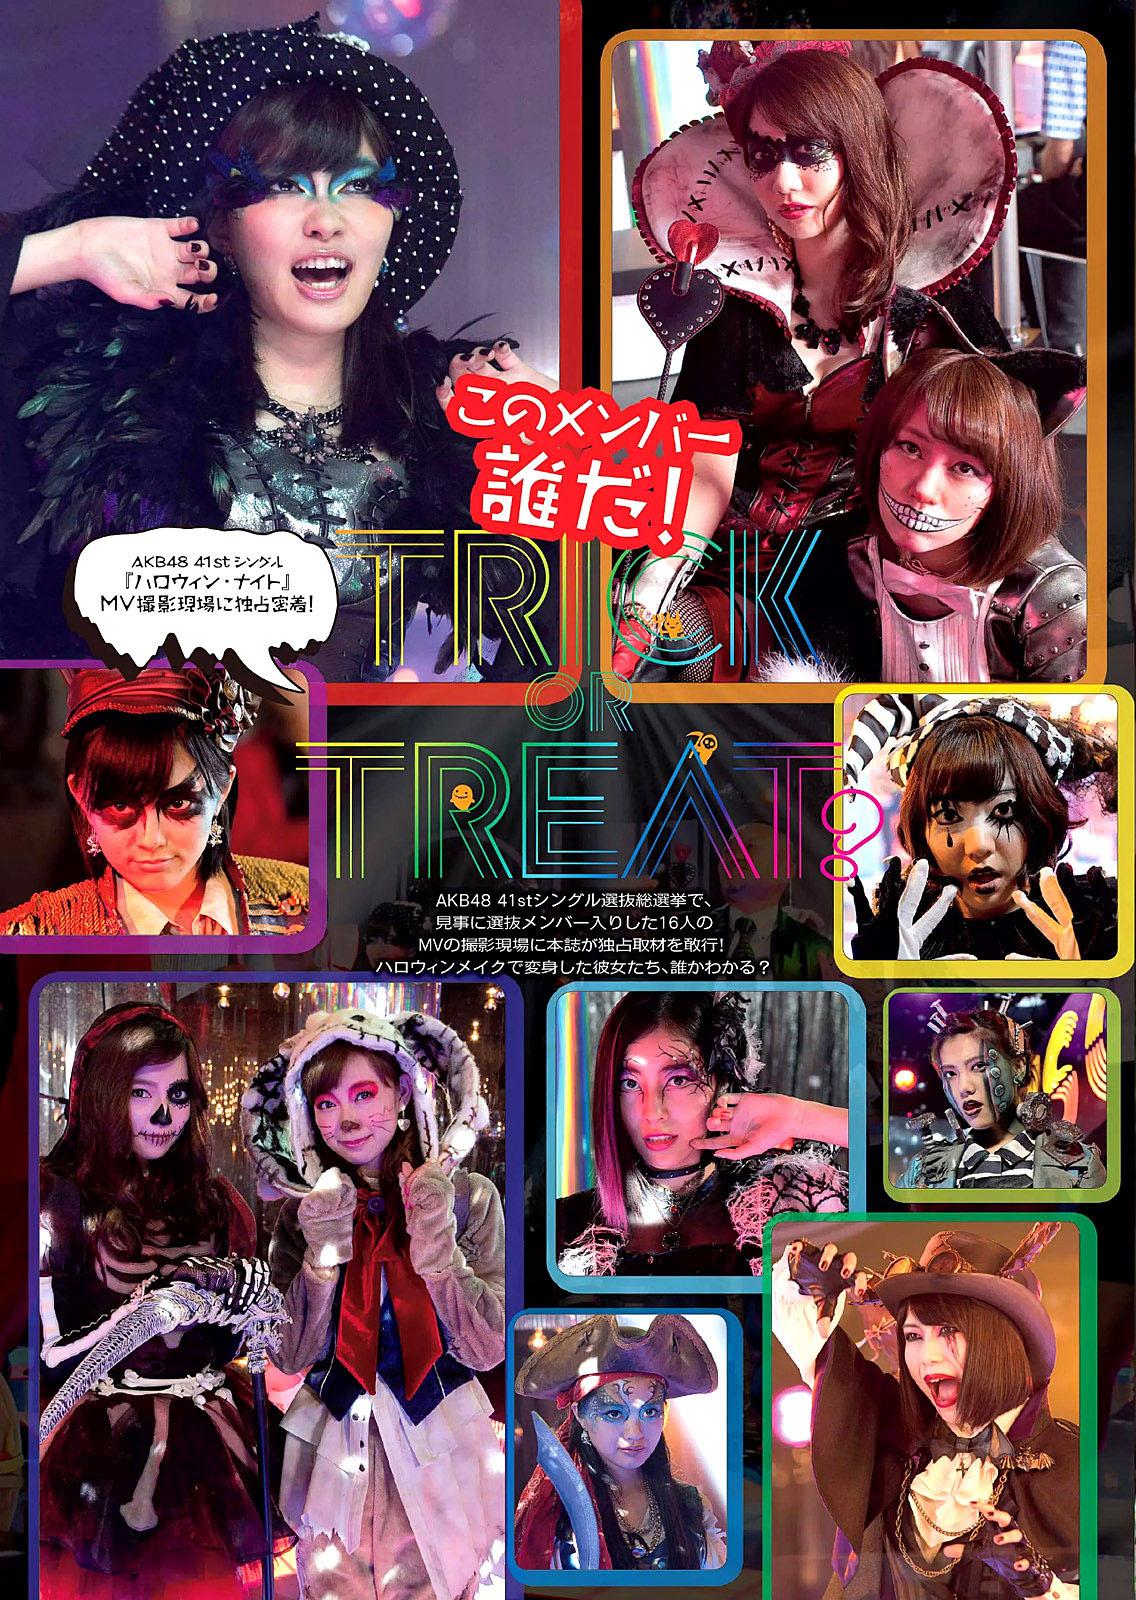 AKB48 WPB 150907 01.jpg